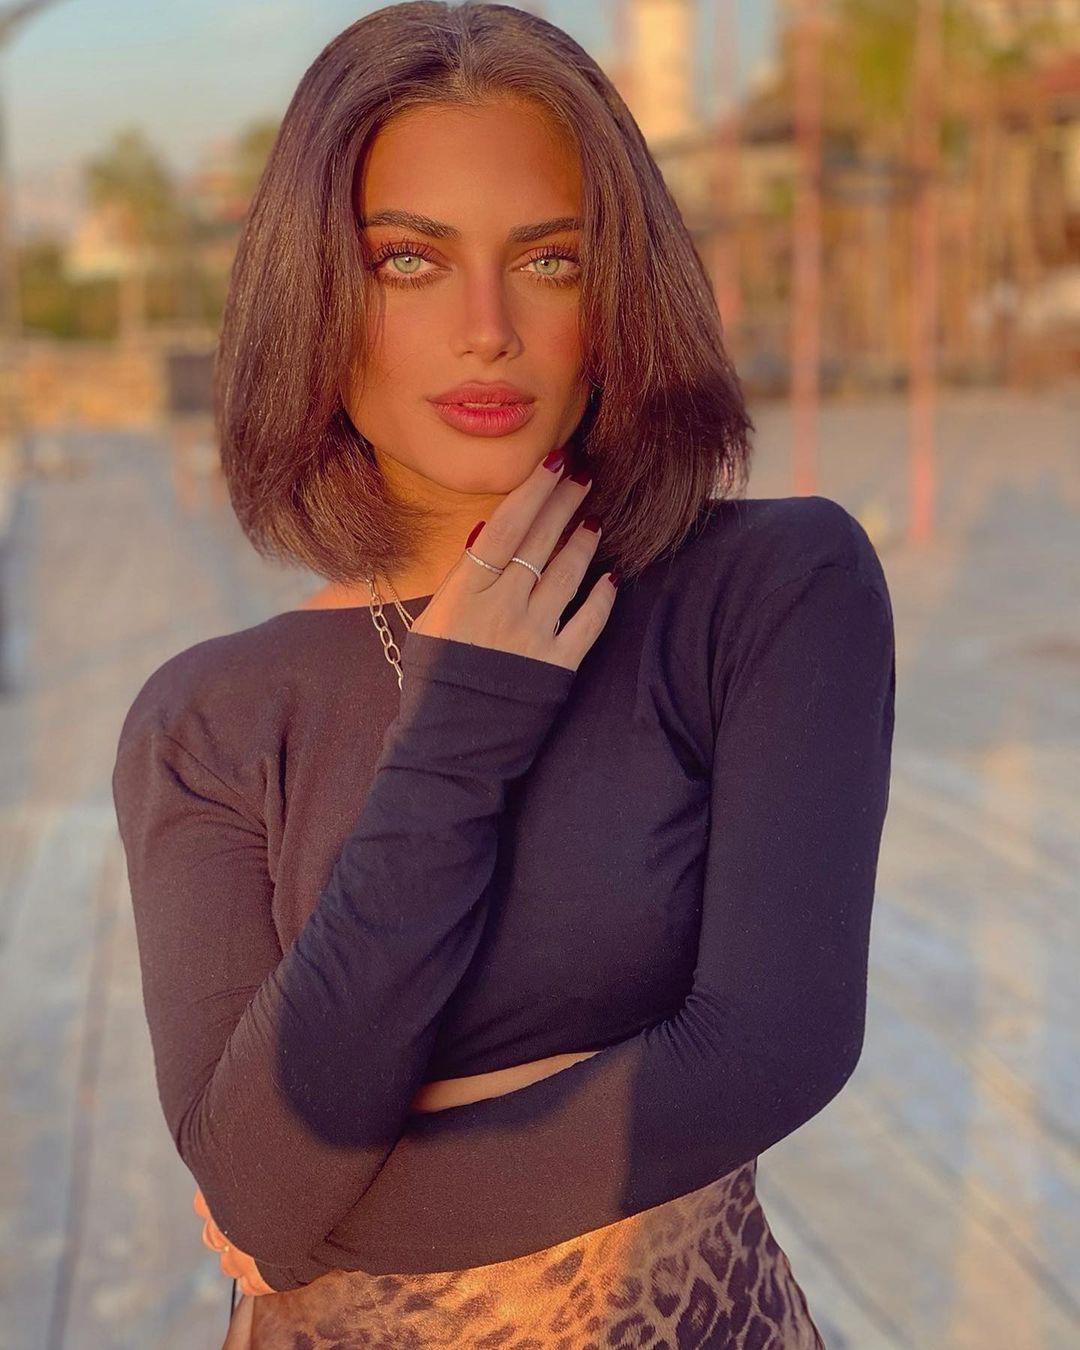 Hiba-Youssef-Wallpapers-Insta-Fit-Bio-5